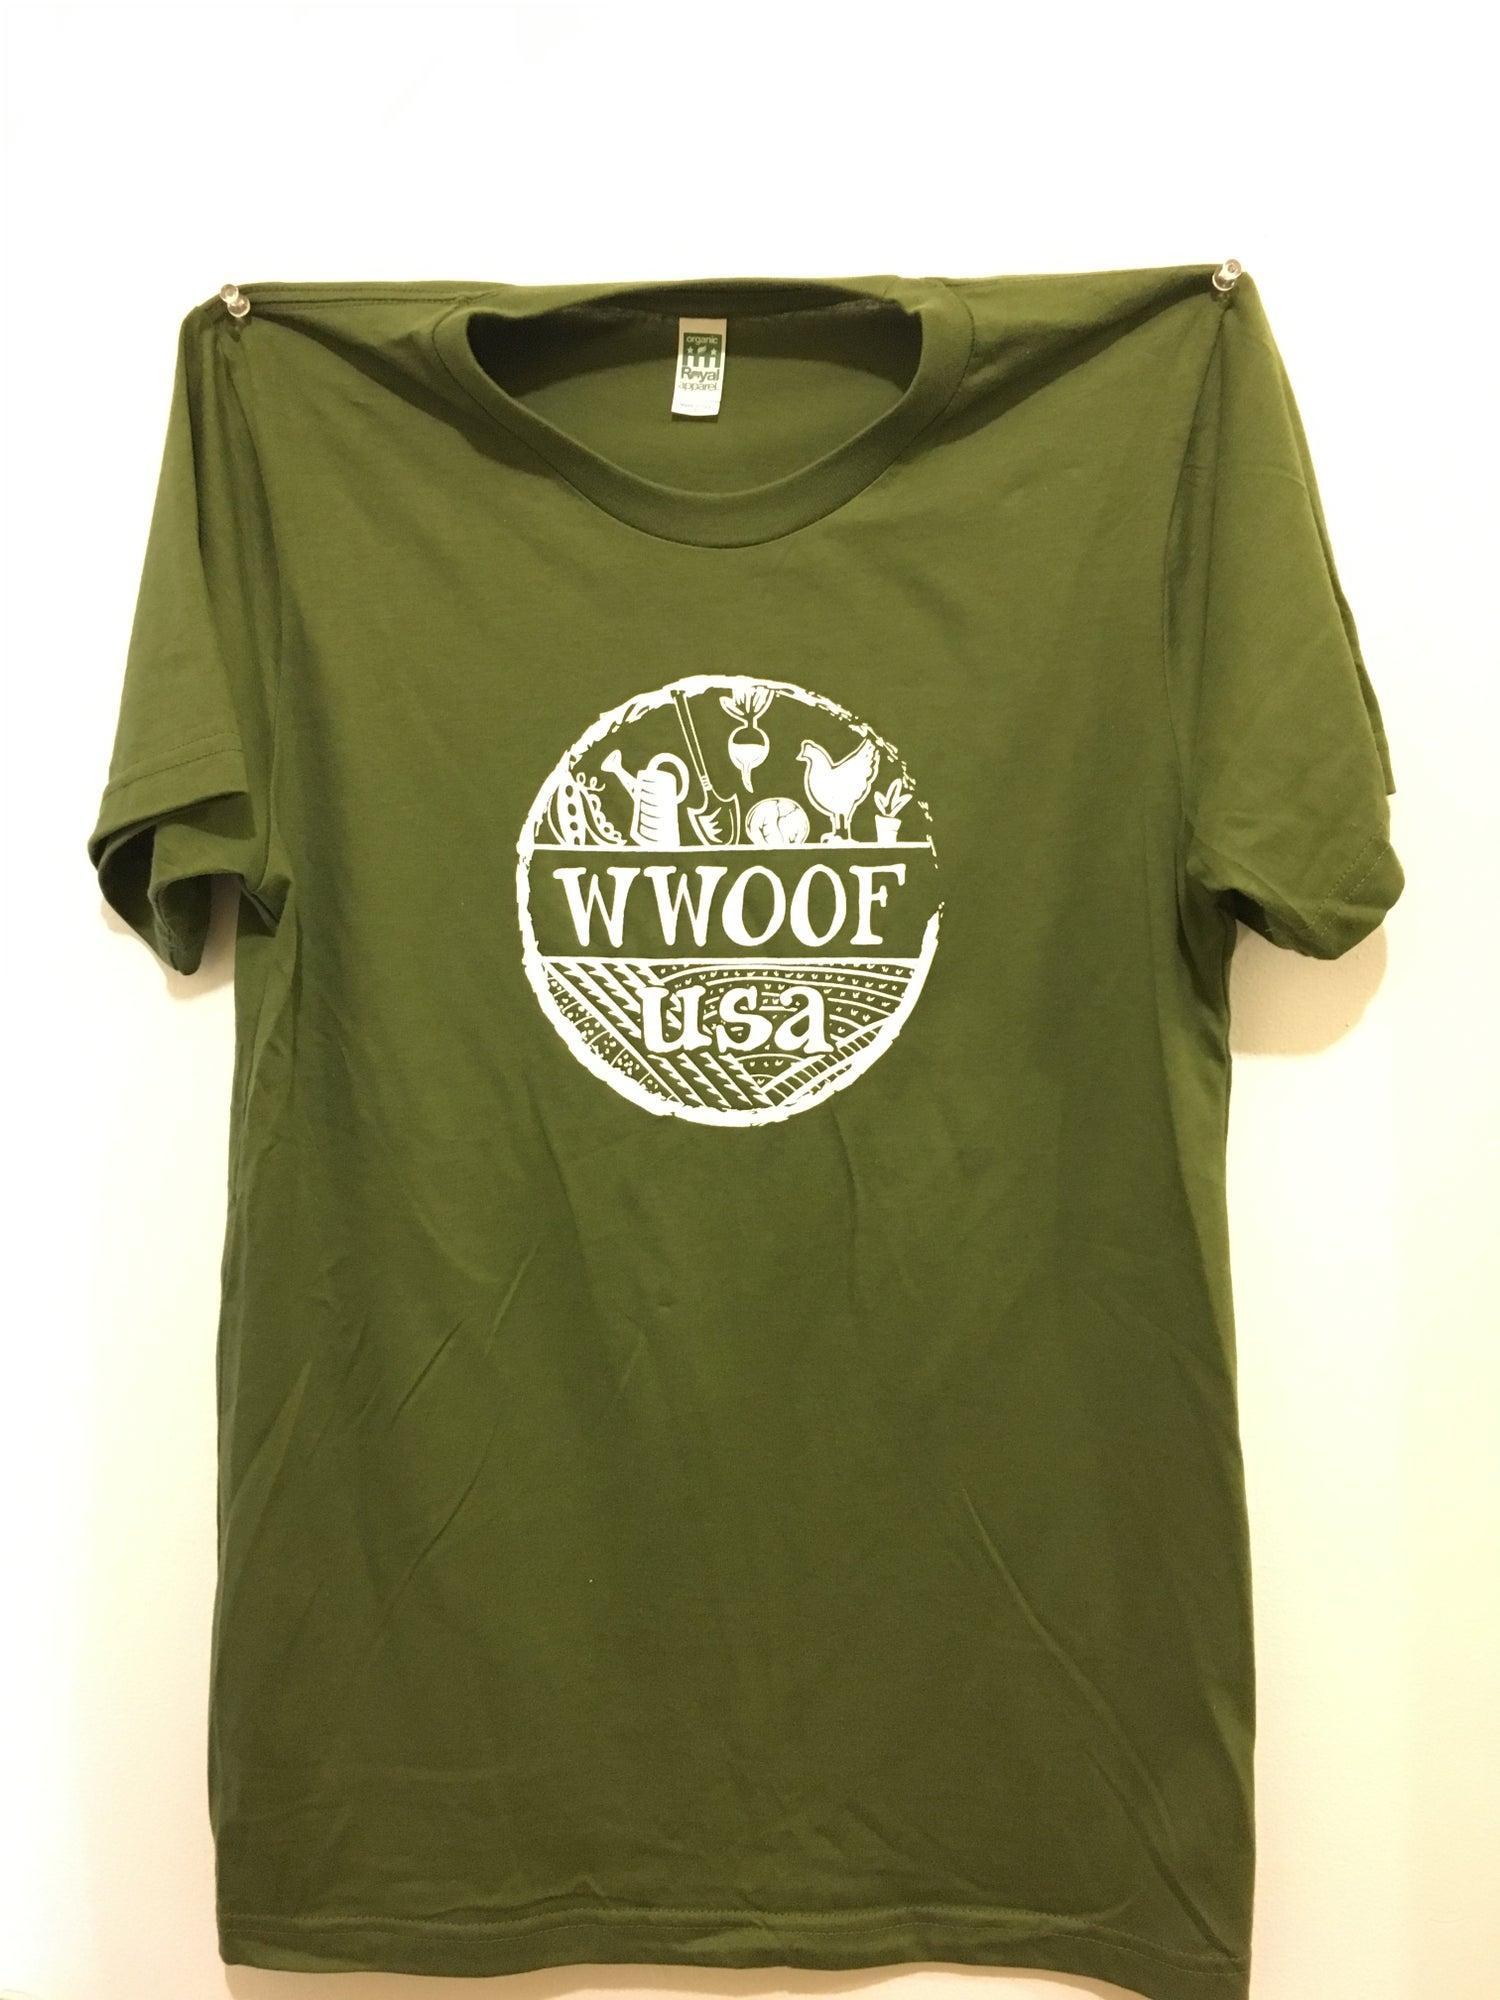 Image of WWOOF-USA Men's T-shirt